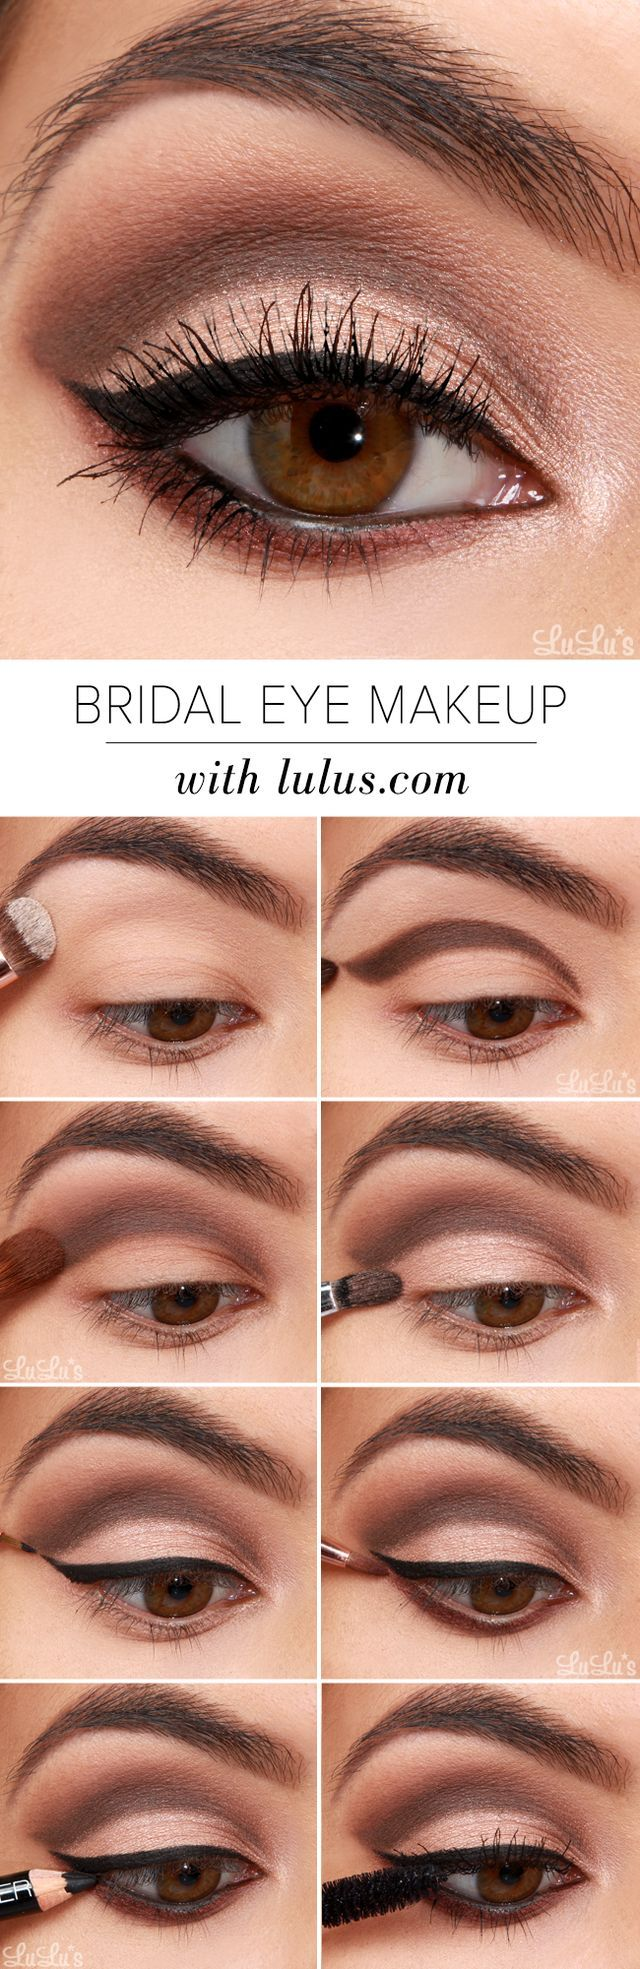 mac makeup looks. lulu*s how-to: bridal eye makeup tutorial (lulus.com fashion blog) mac looks i